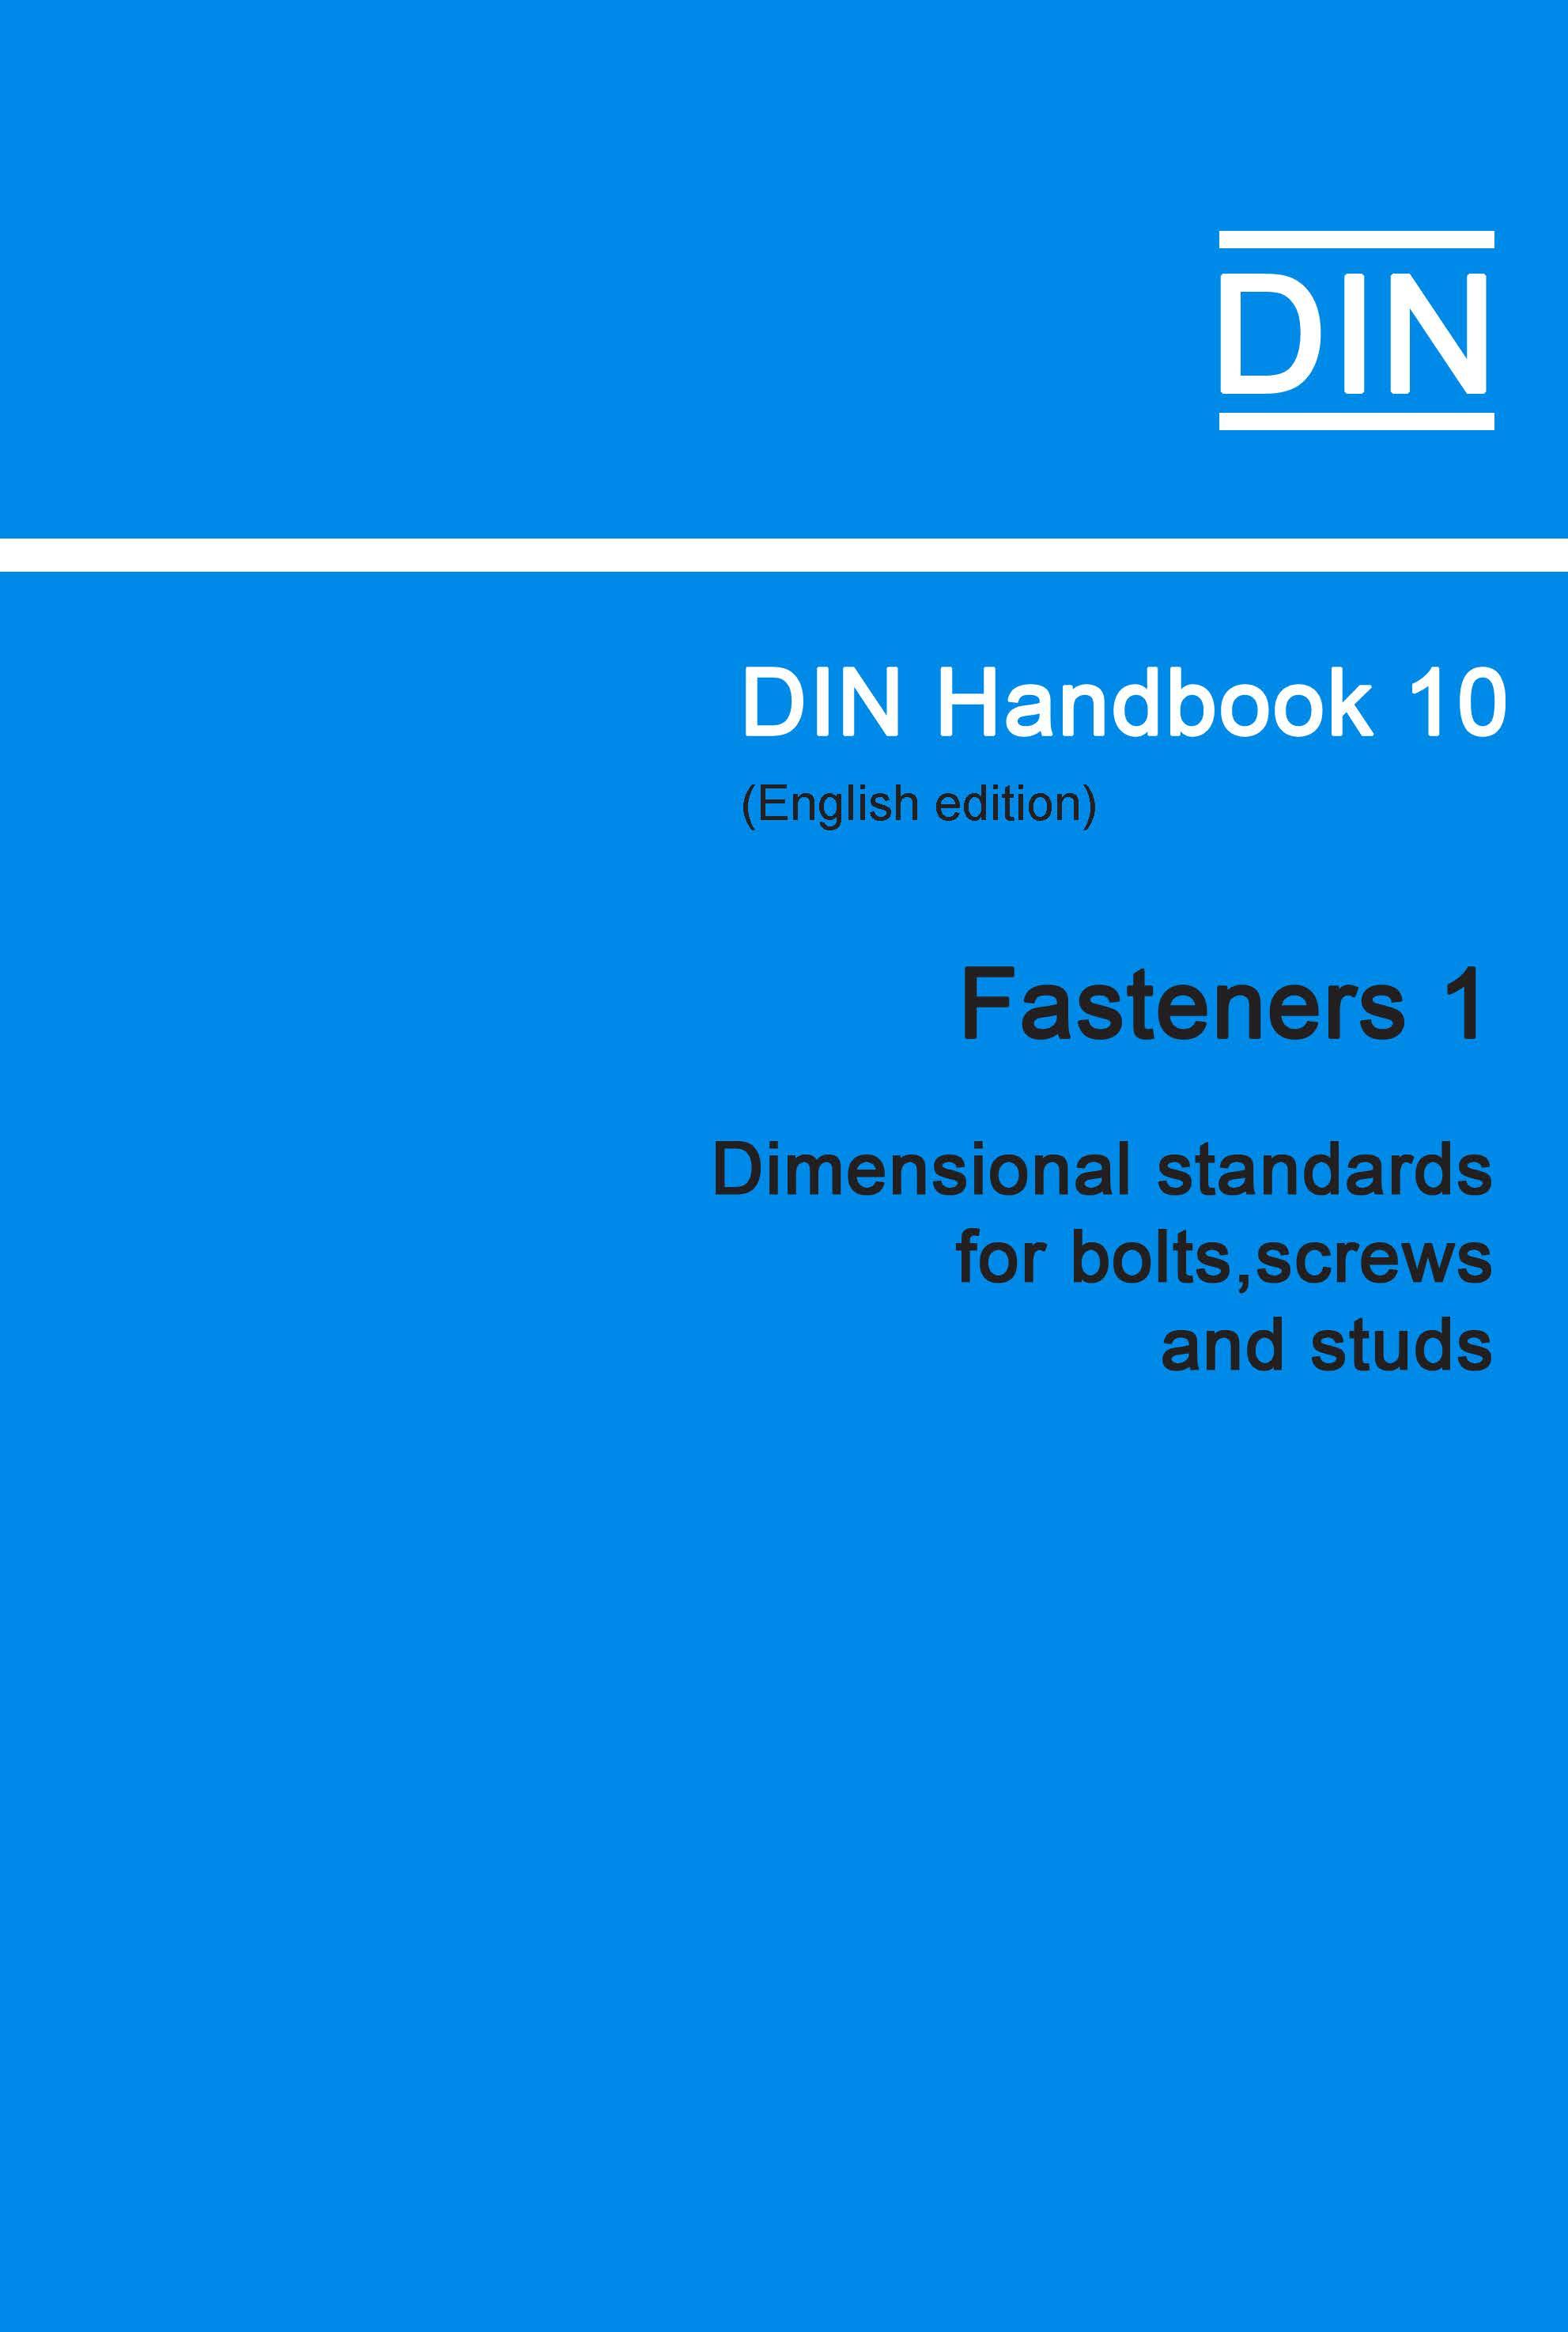 (DIN Handbook  10 Fasteners 1 (Dimensional Standar...